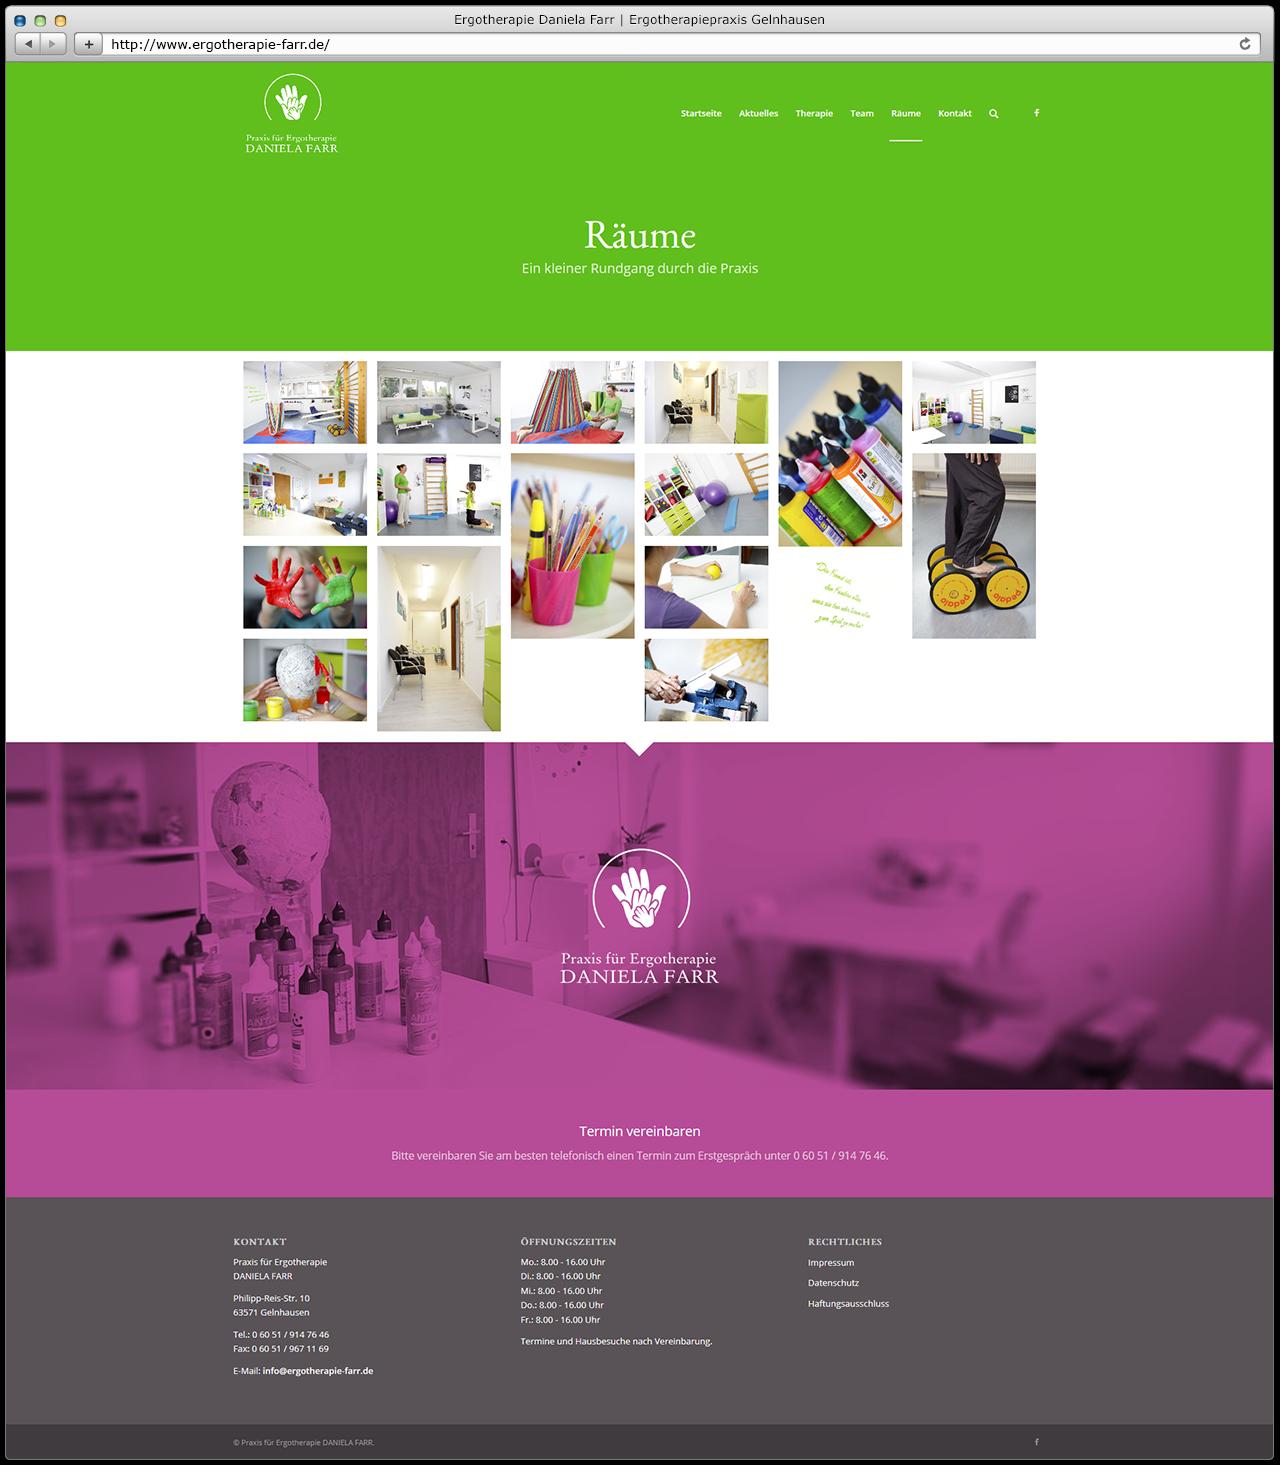 daniela-farr_website_01-3